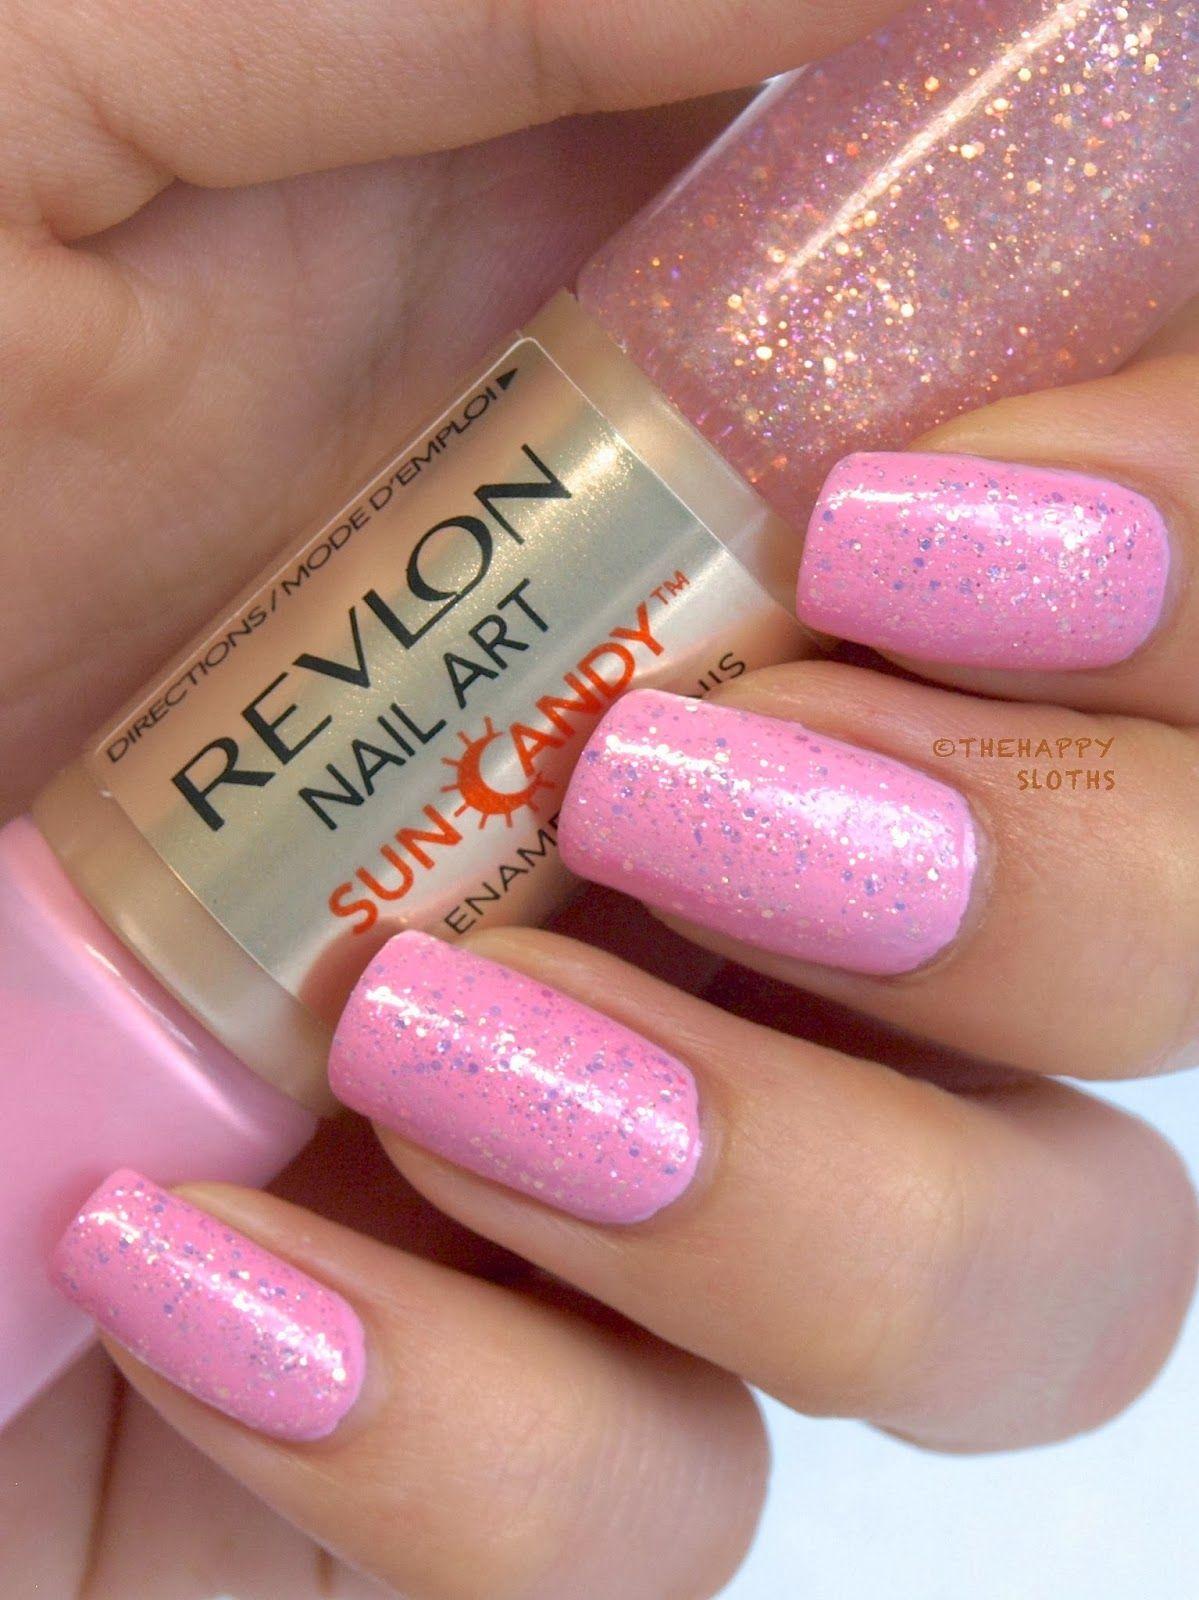 Revlon Nail Art Sun Candy Nail Enamel In Pink Dawn Fiery Sky